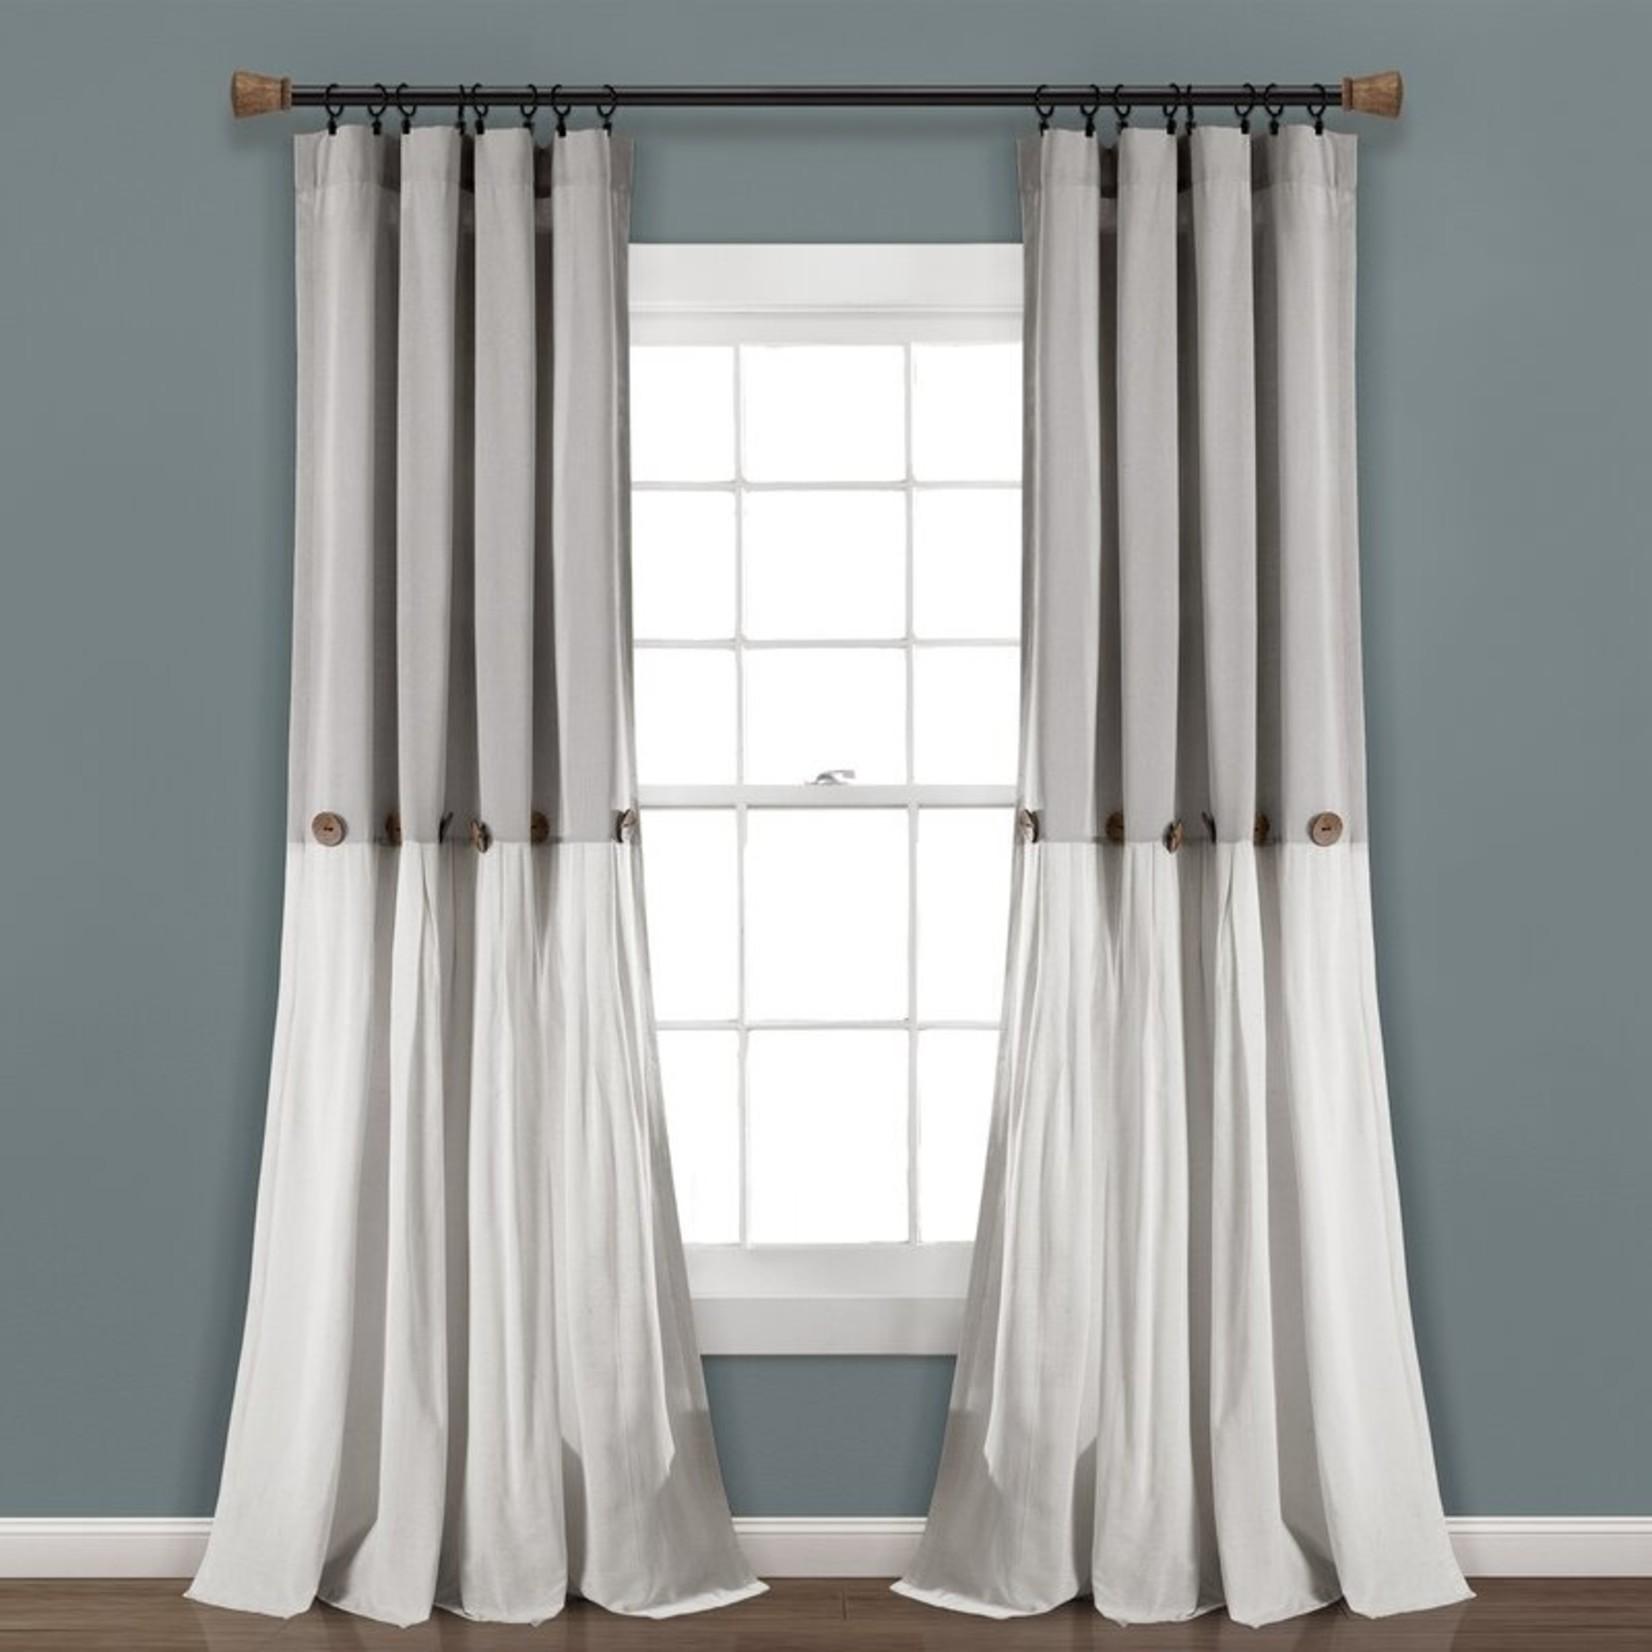 "*40"" x 96"" - Ruya Window Semi-Sheer Rod Pocket Single Curtain Panel"